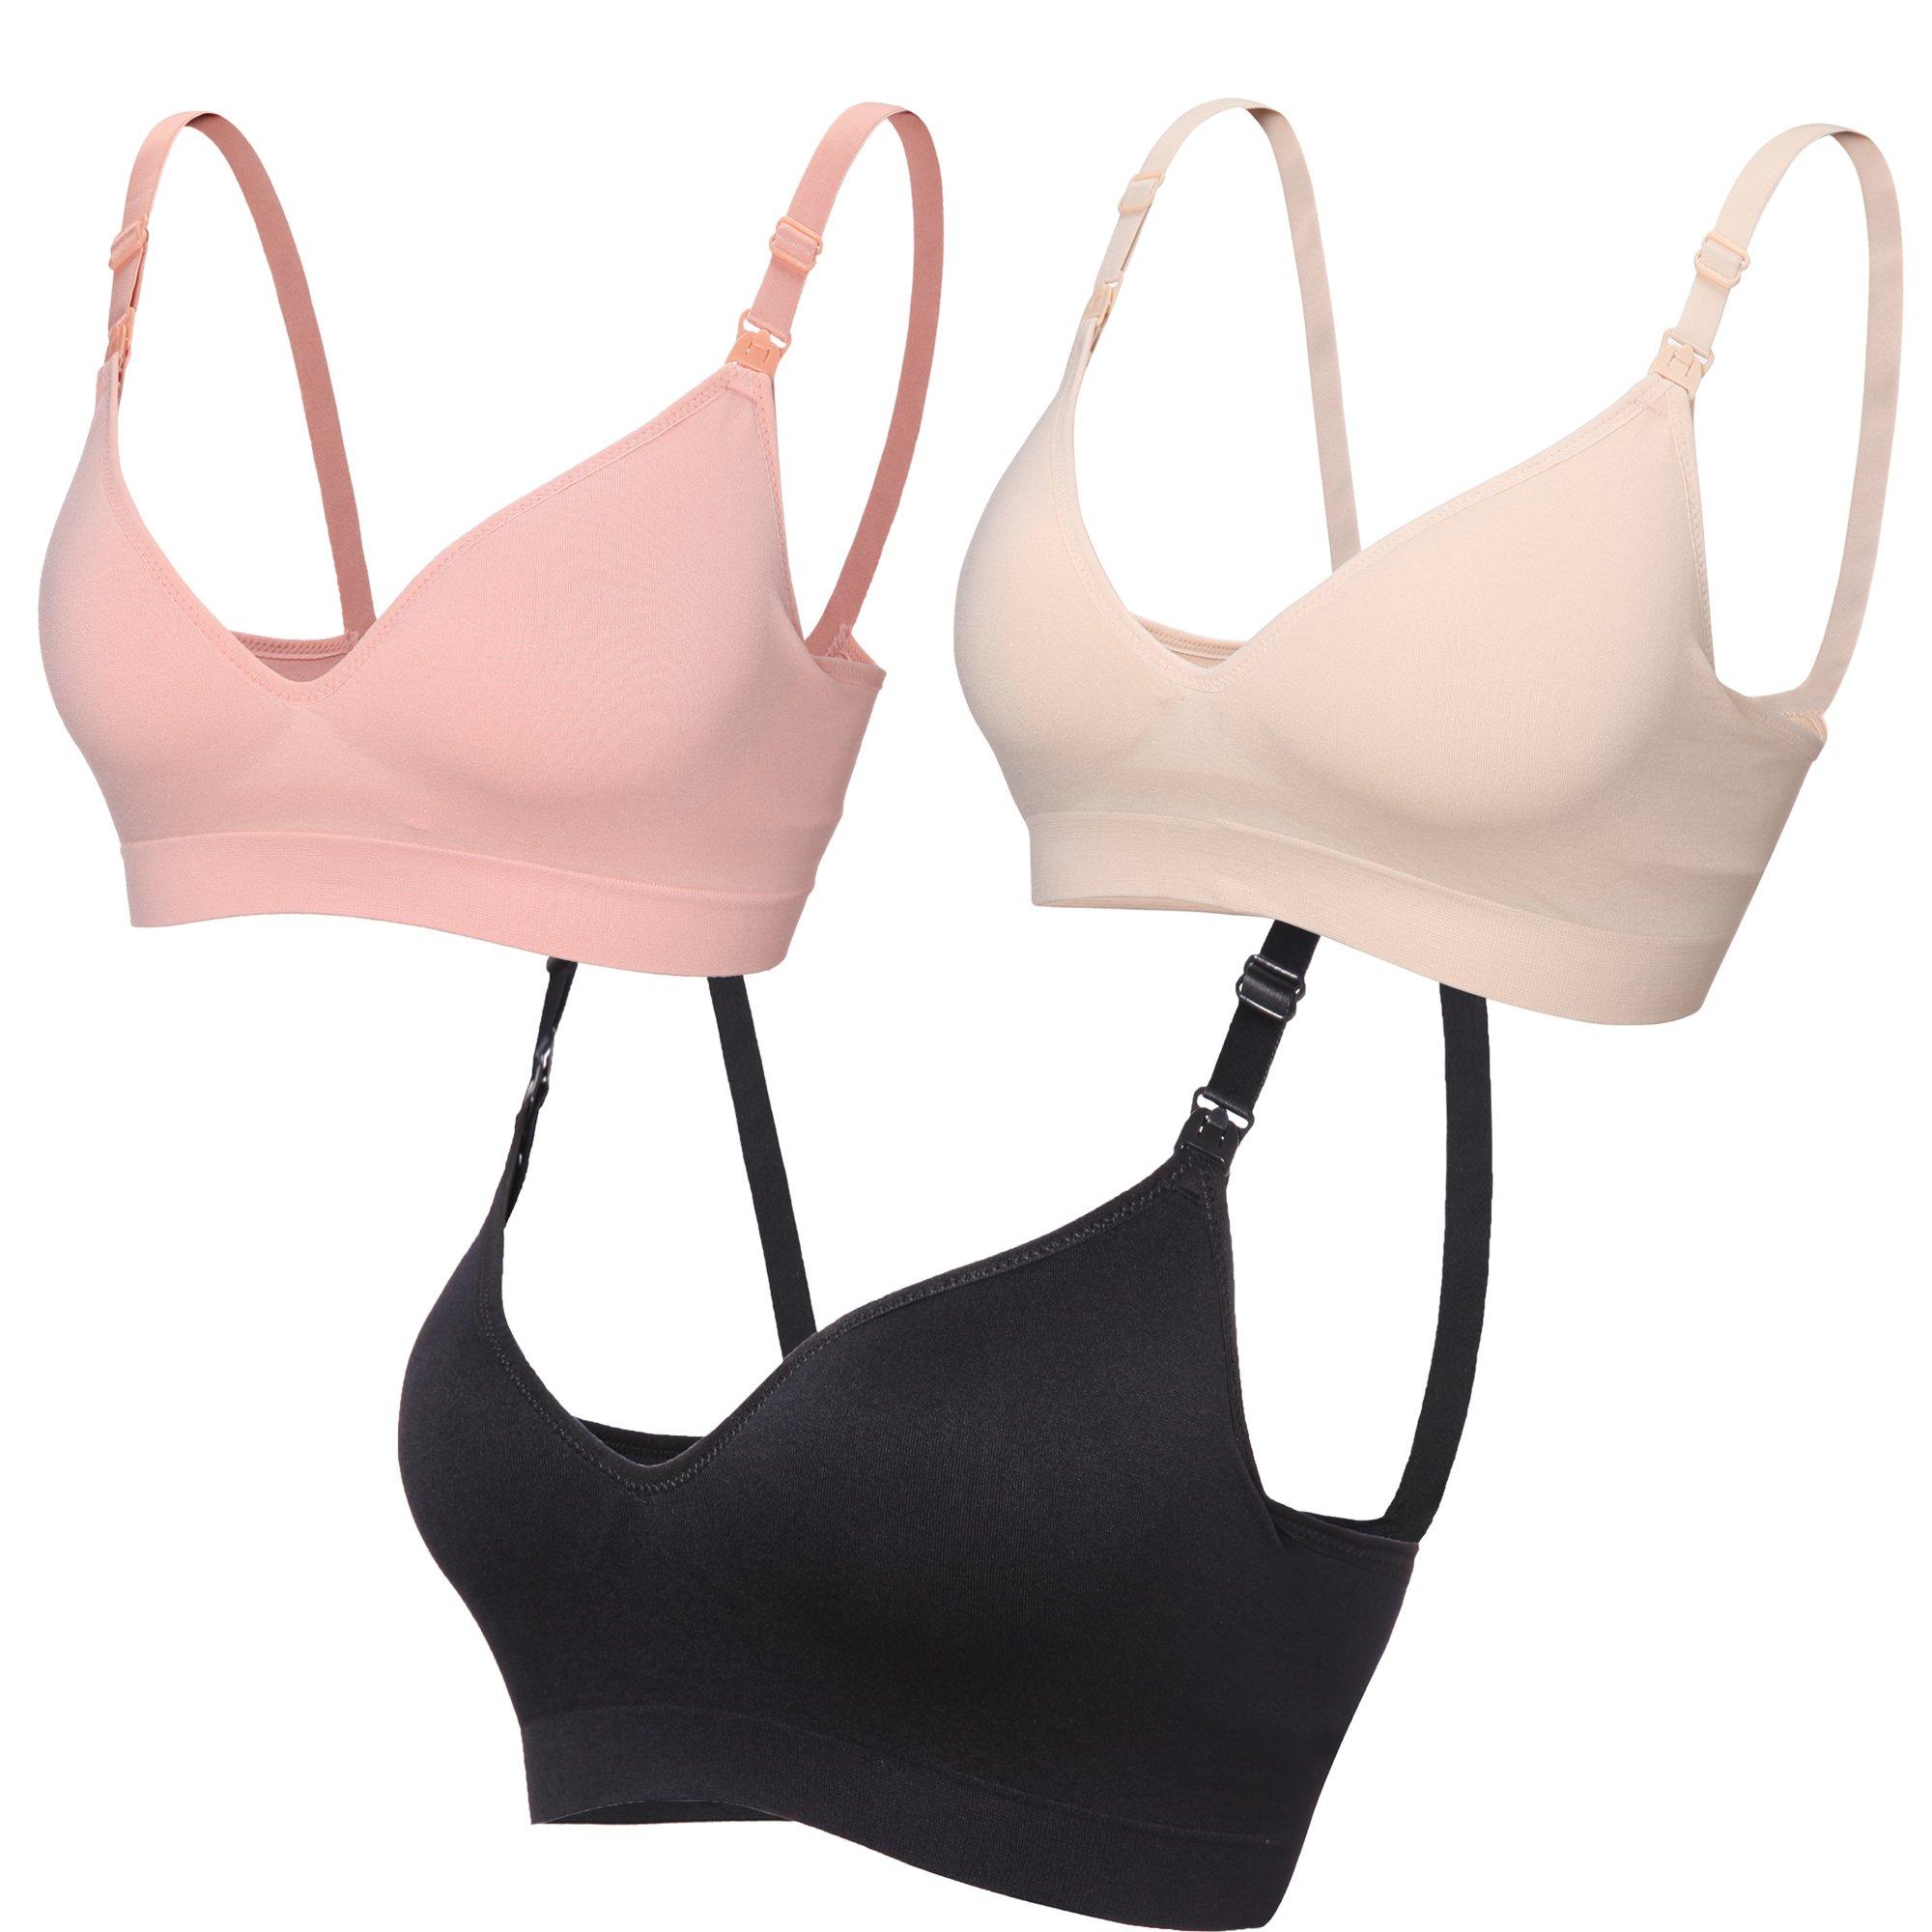 BAOMOSI Women's Seamless Nursing Maternity Bra Push Up Comfort Sleep Bralette, 3pack(beige+black+pink), Medium